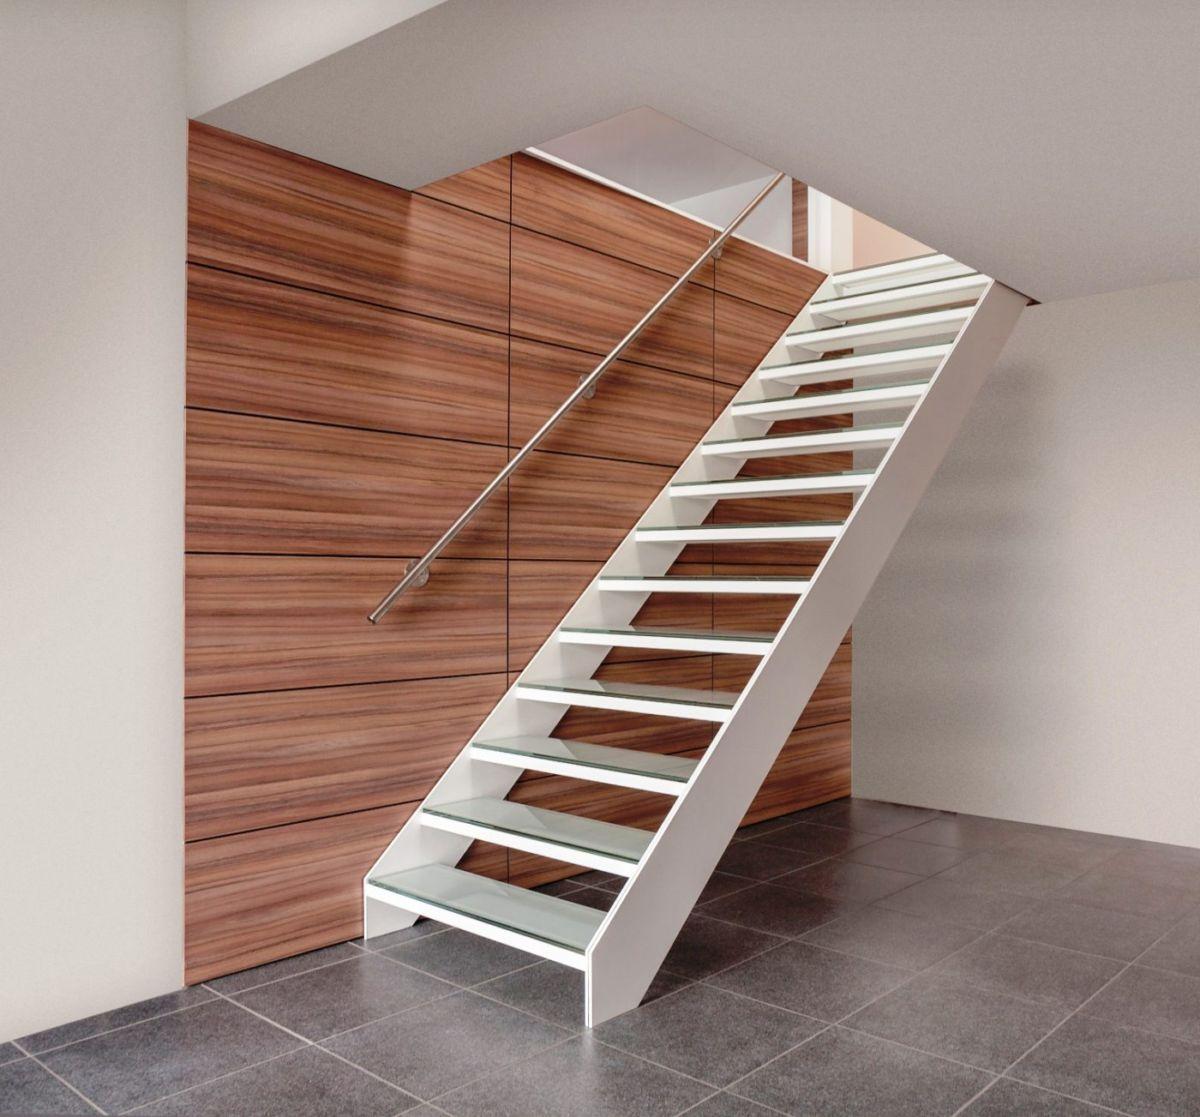 travaux confort escalier graah slide design aluminium trap escalier stair treppen